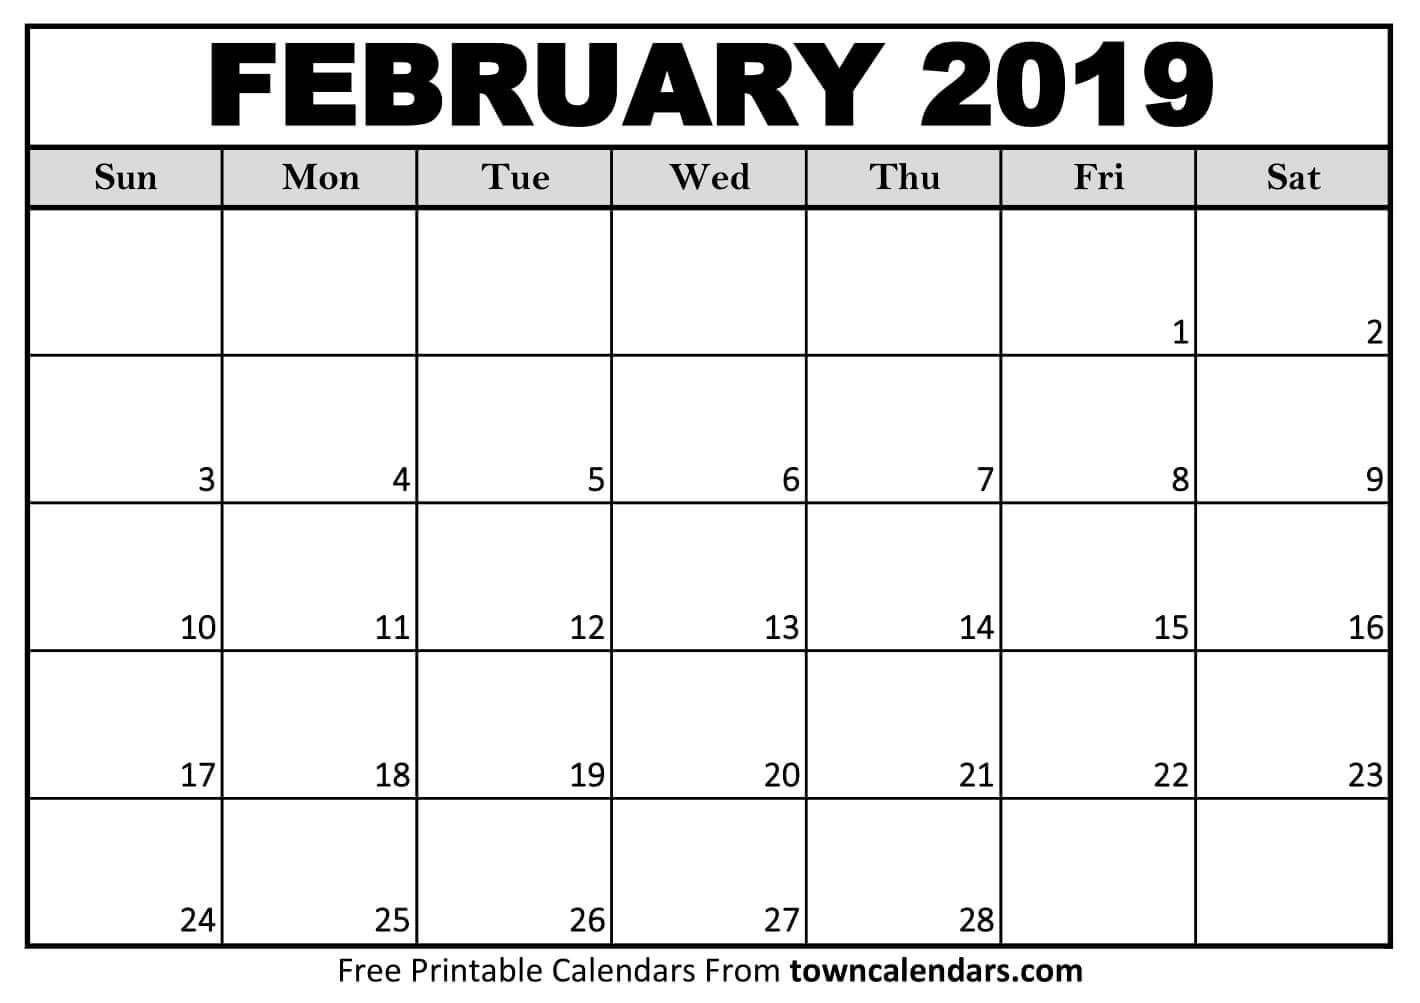 Free Printable February Calendars 2019 Printable February 2019 Calendar towncalendars